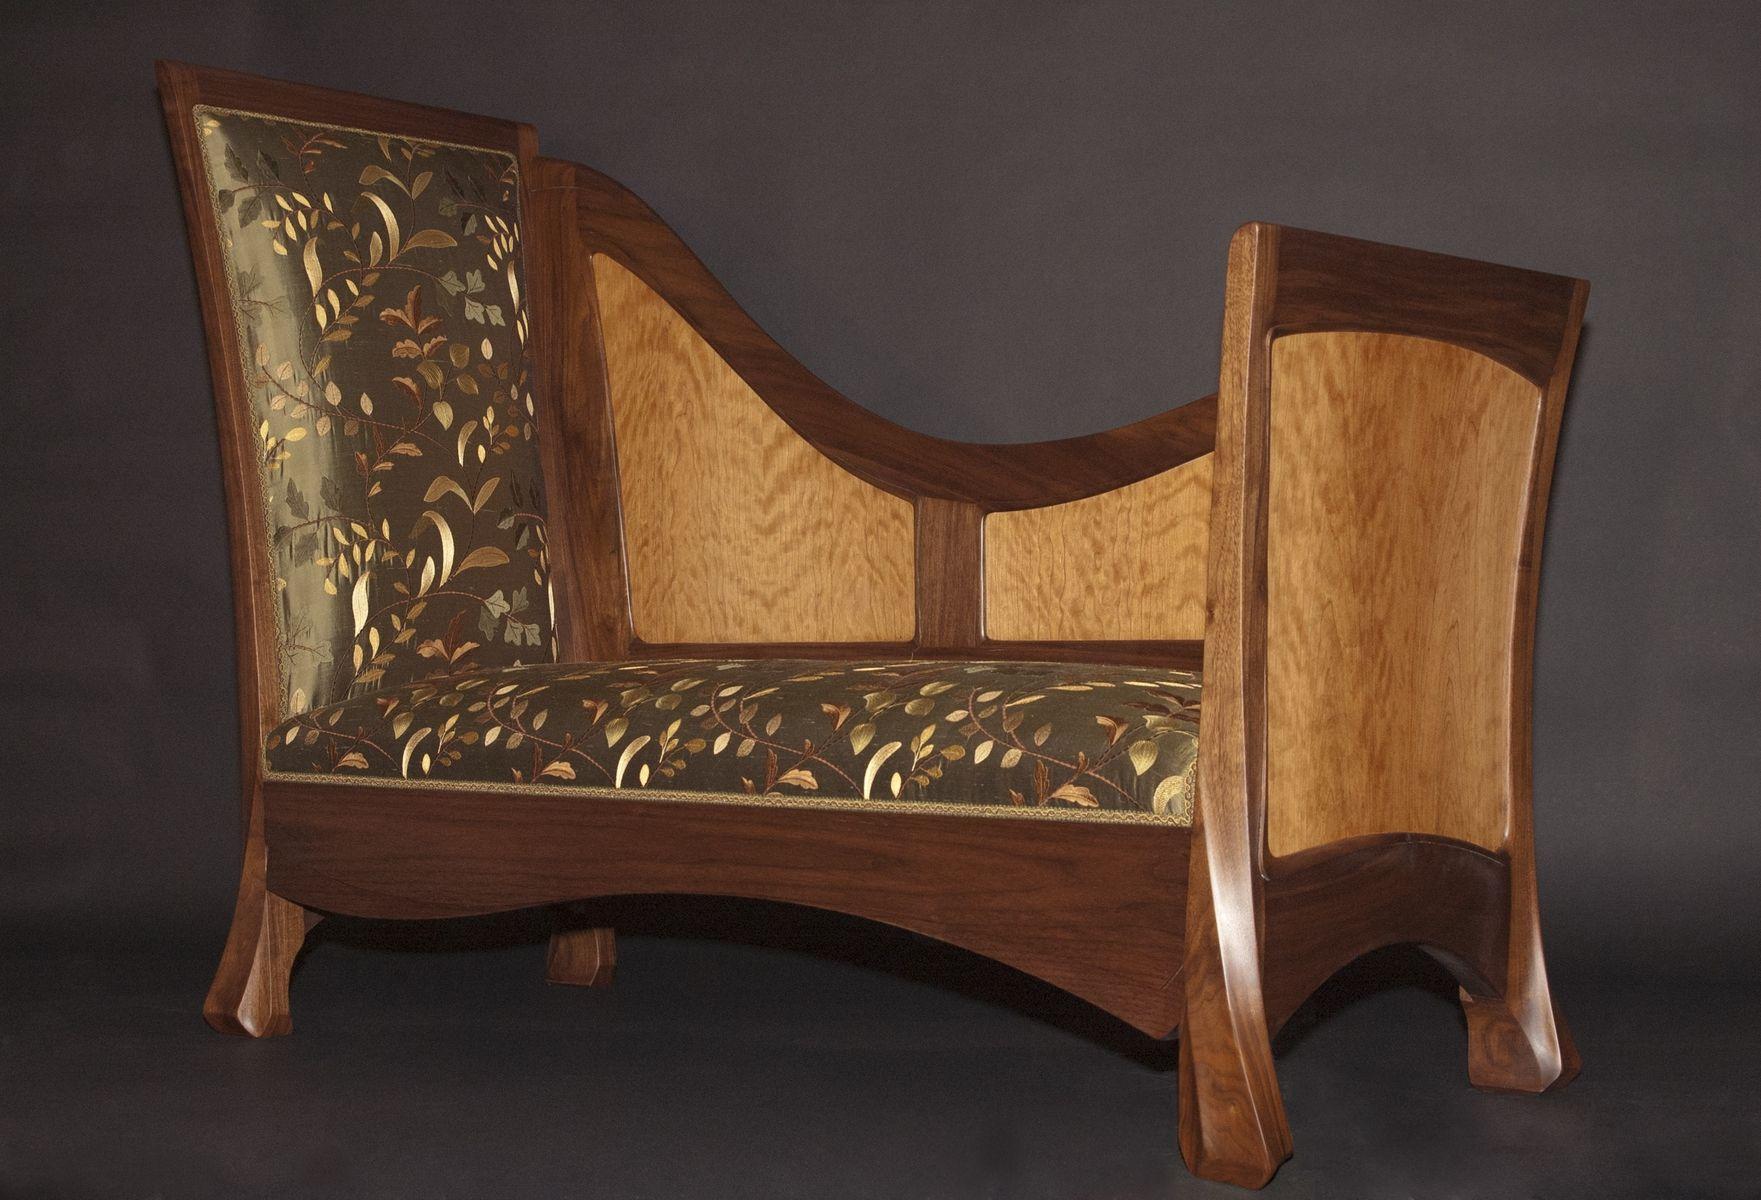 Custom Art Nouveau Window Bench By J Rivers Furniture